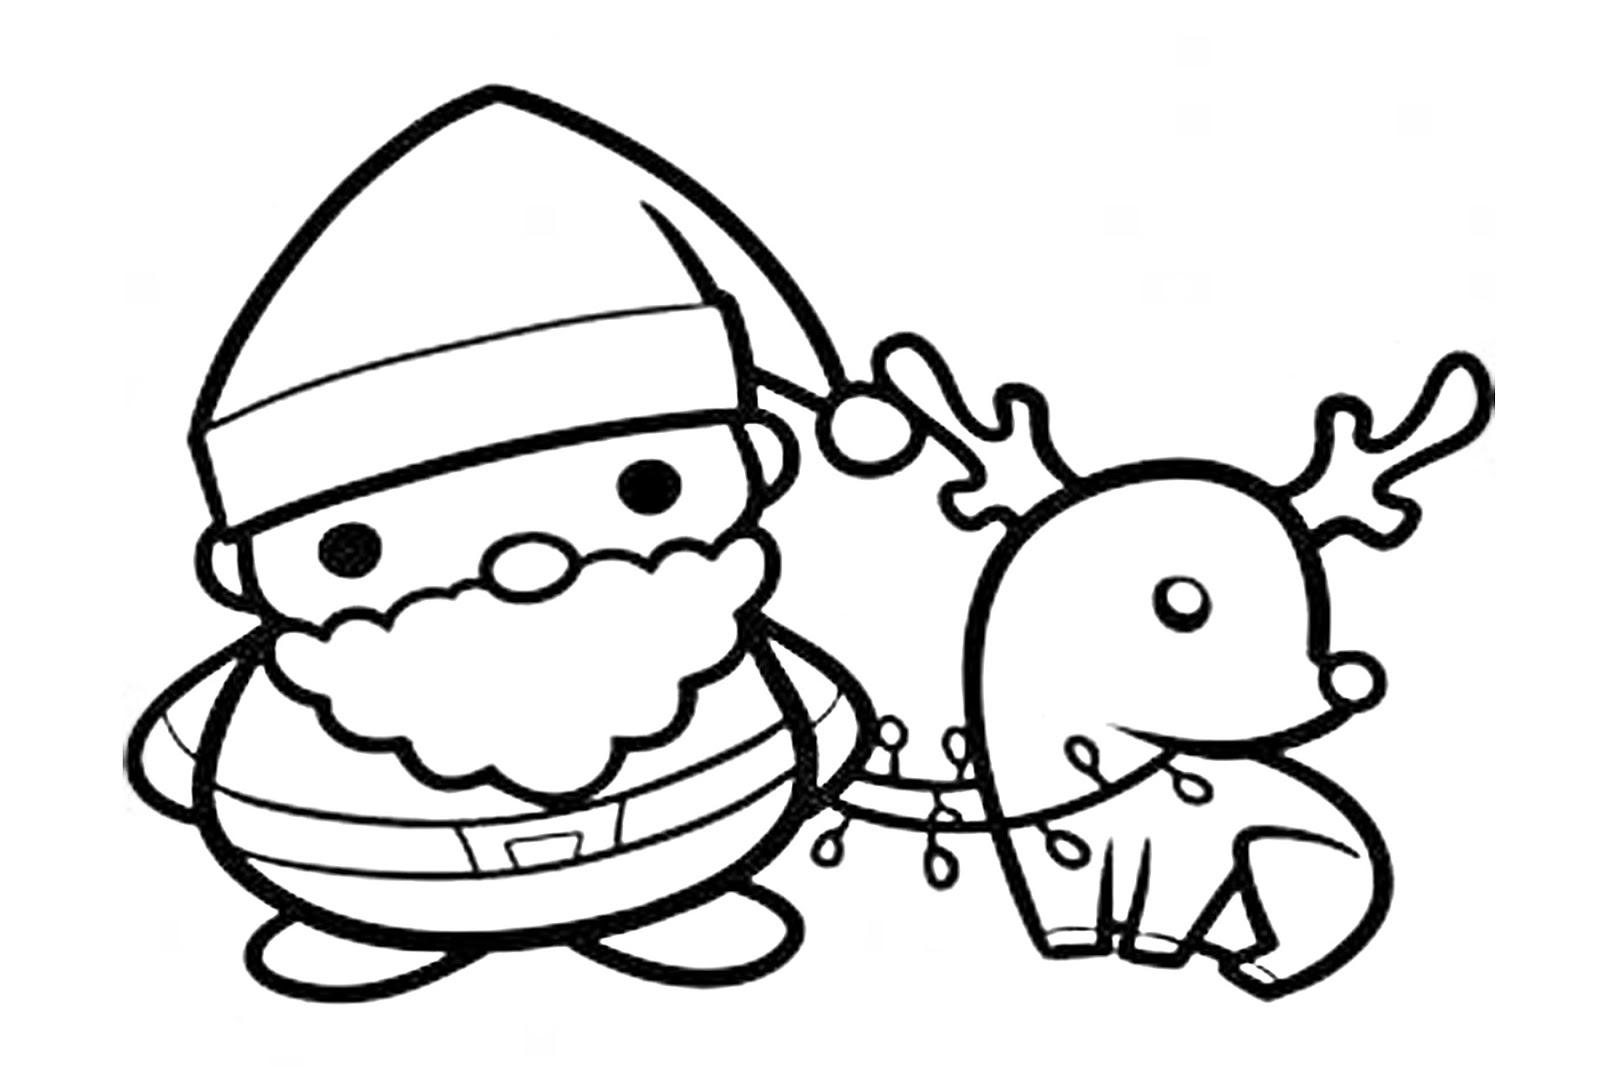 Dibujos Para Colorear Cara De Santa Claus ~ Ideas Creativas Sobre ...